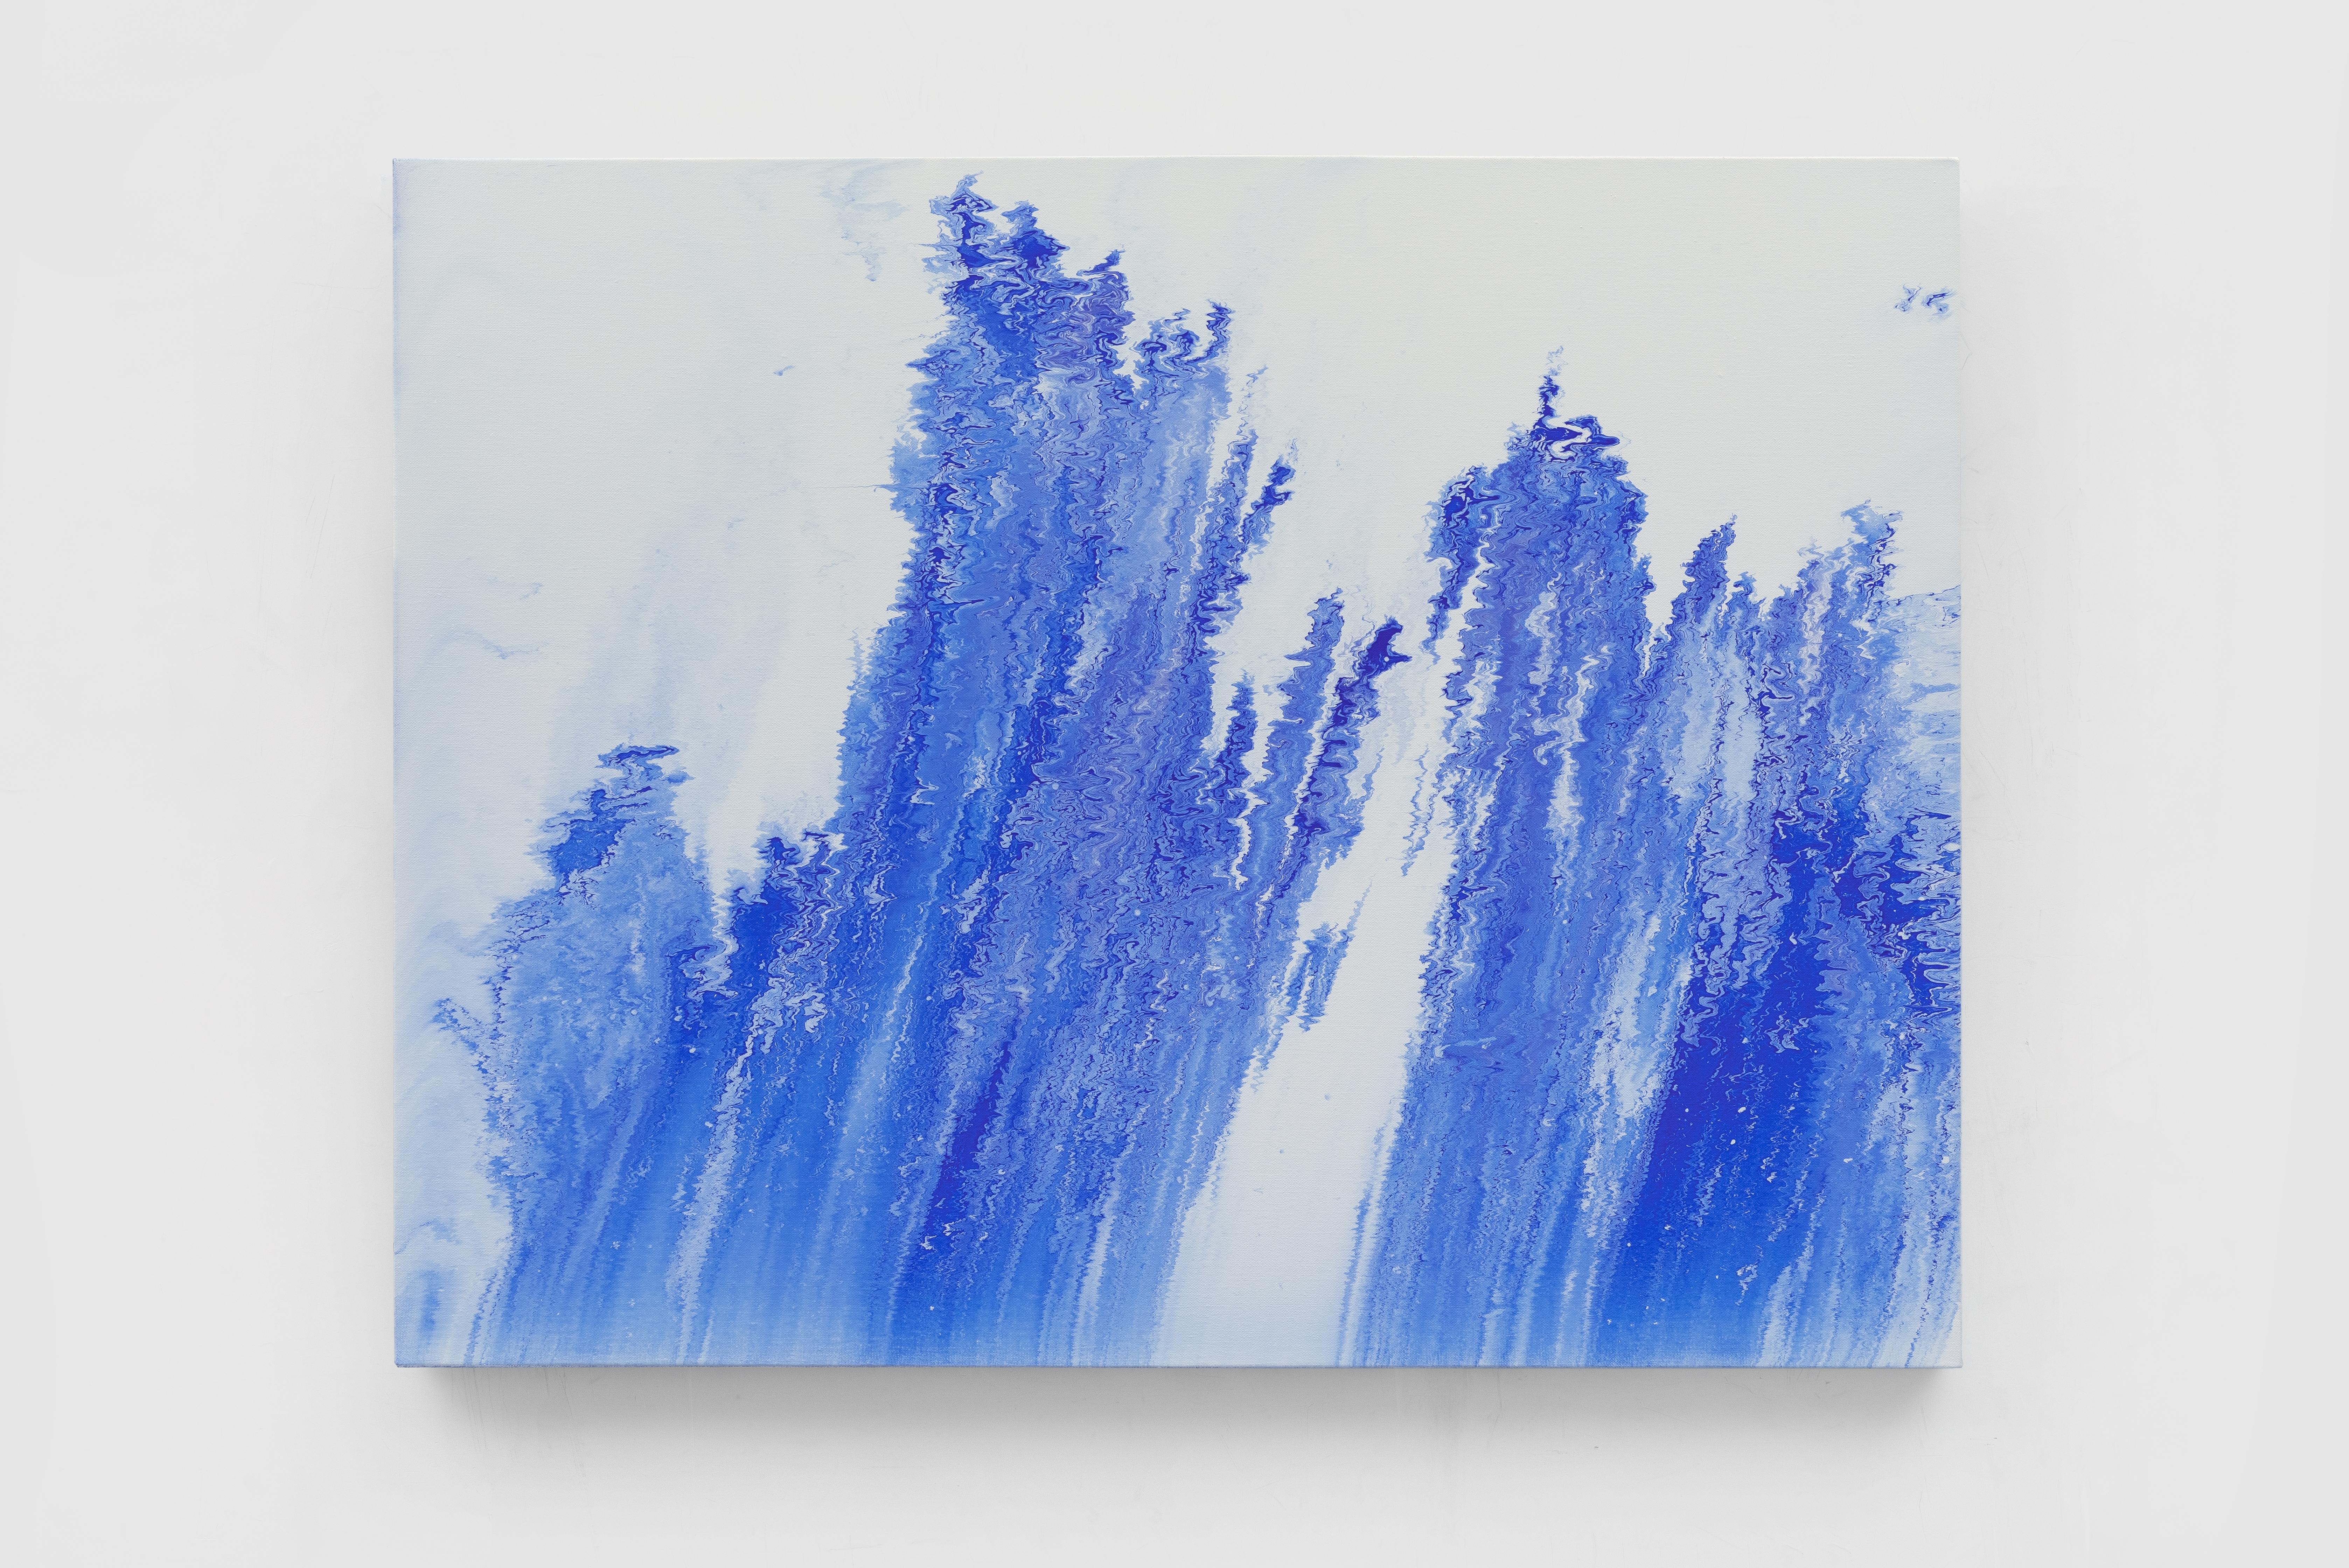 Blue AU - Yanhongchi